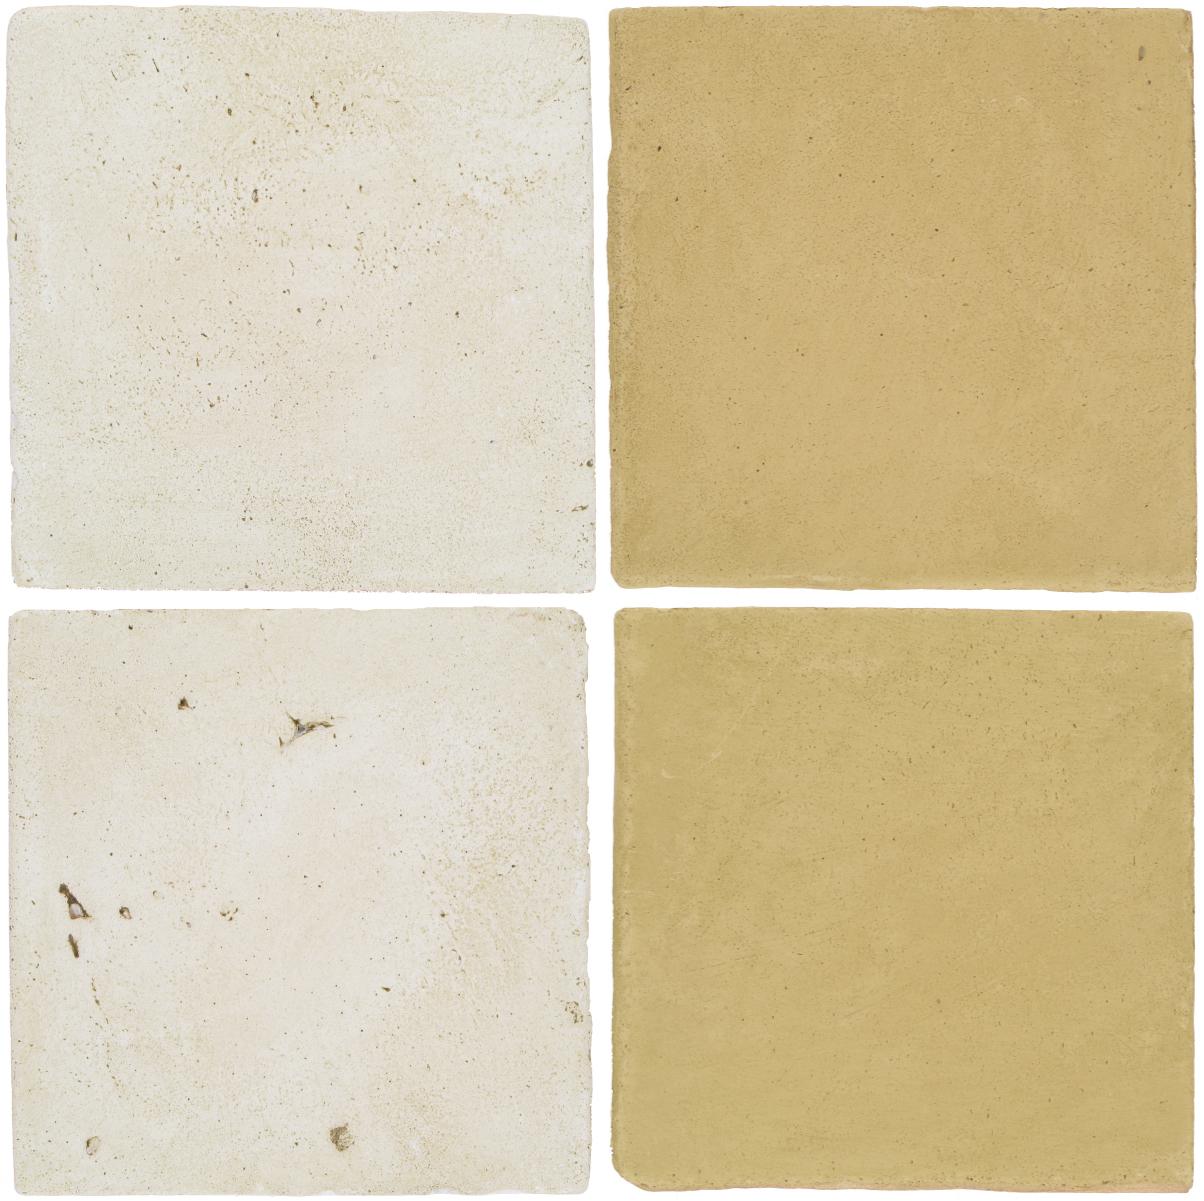 Pedralbes Antique Terracotta  2 Color Combinations  VTG-PGAW Antique White + OHS-PGGW Golden W.